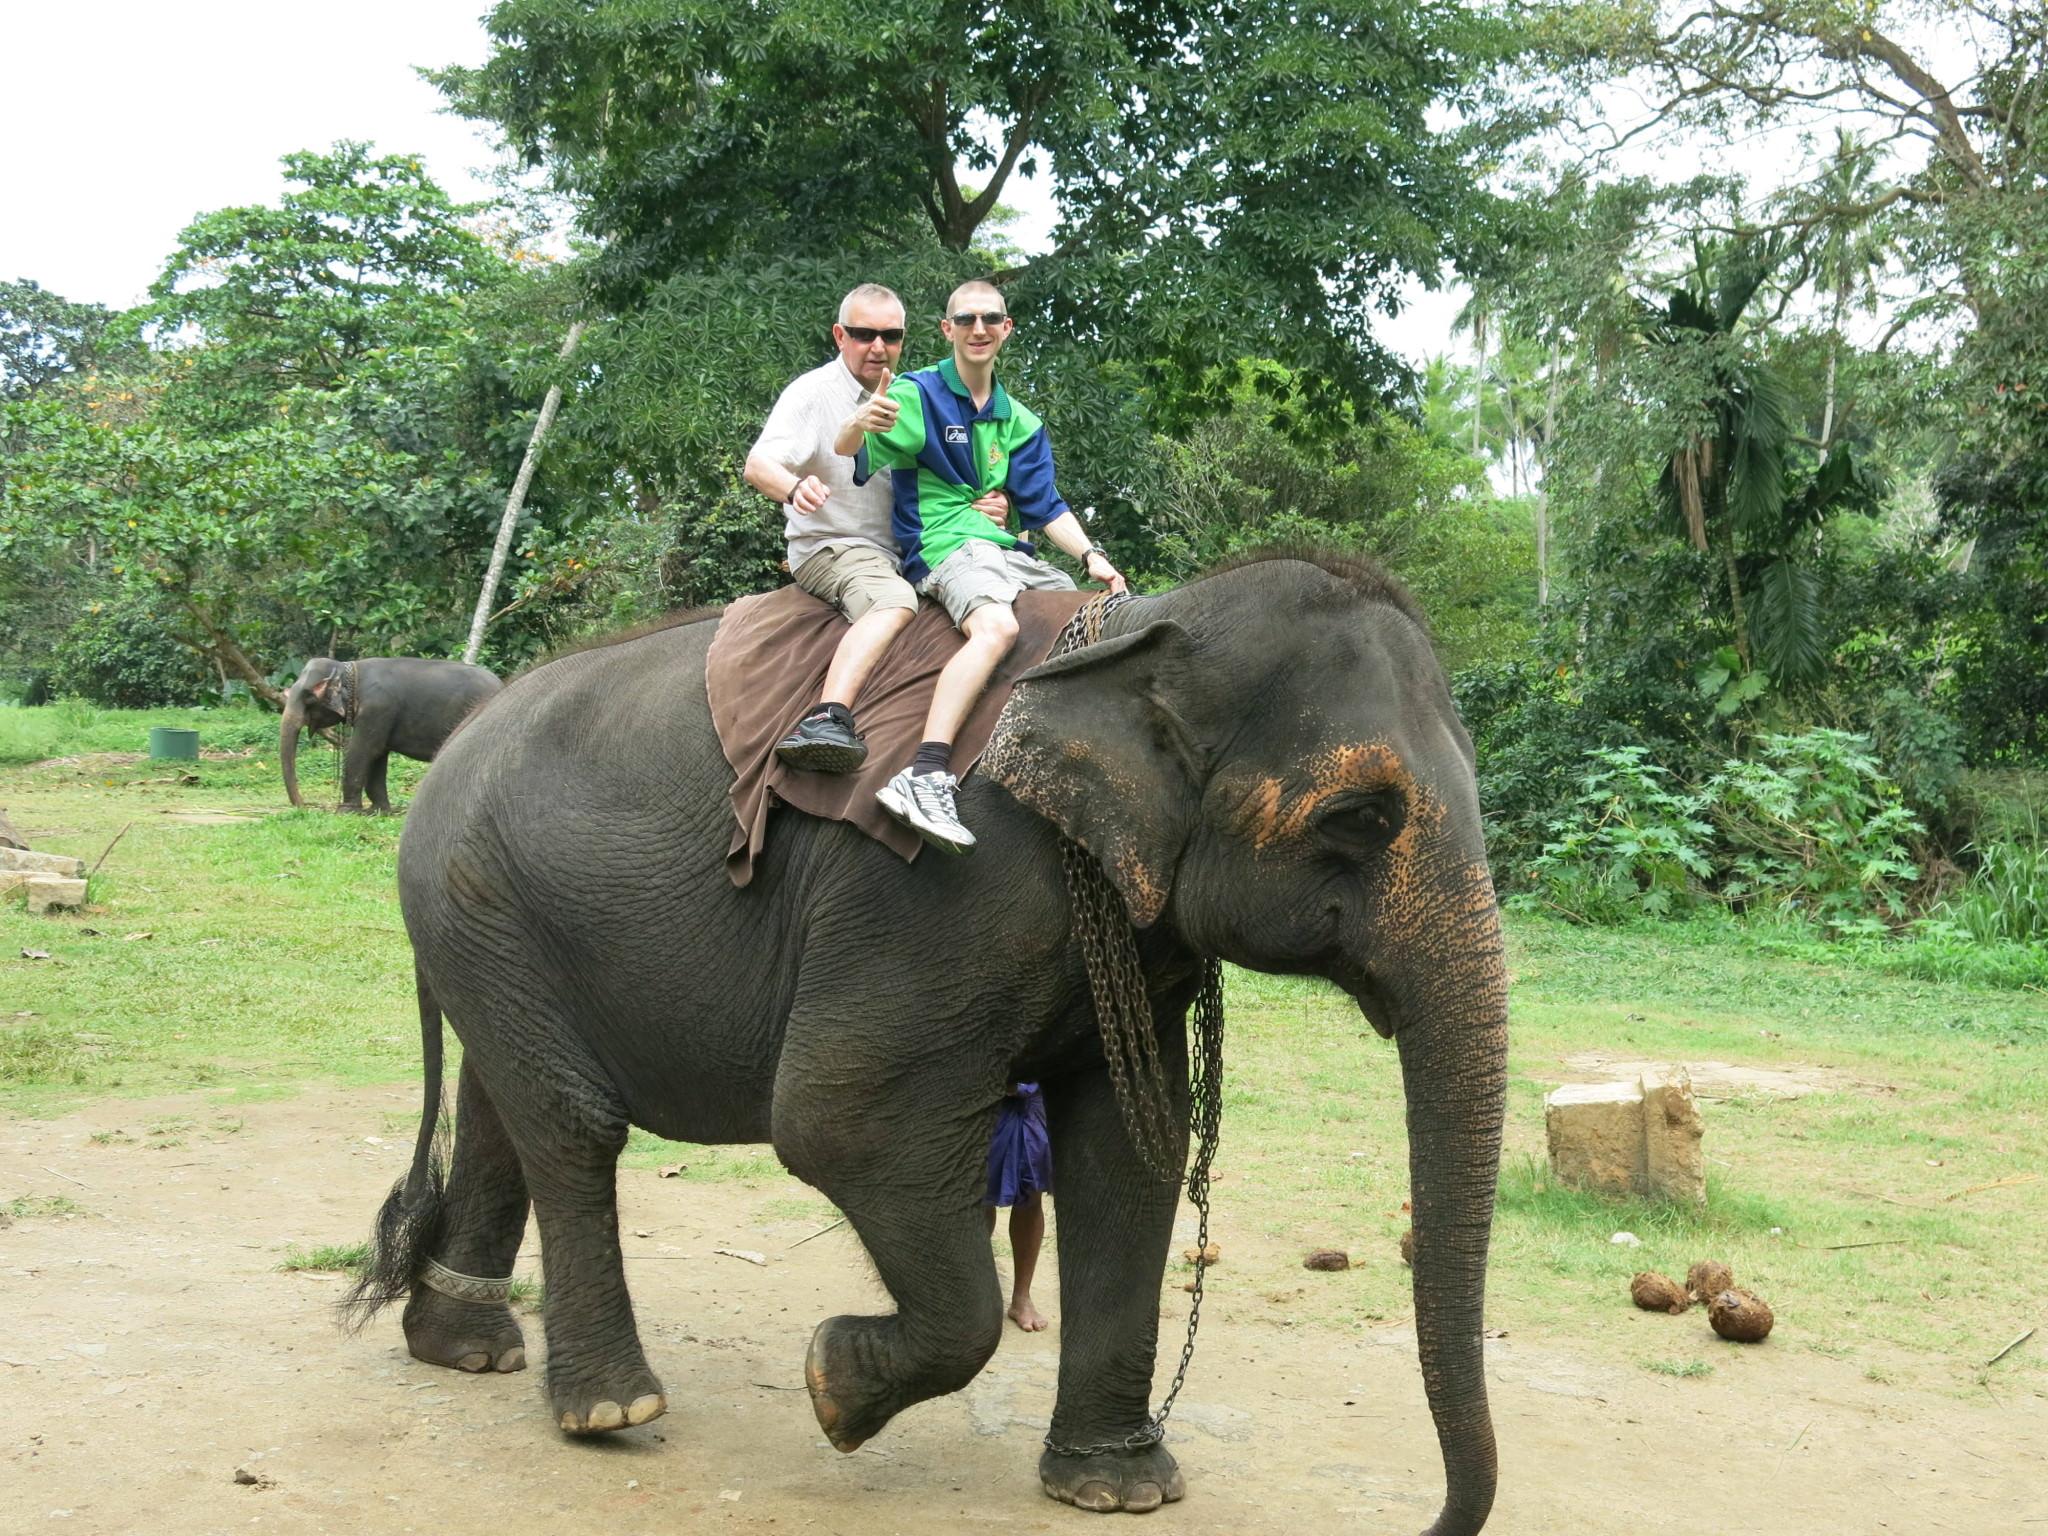 elephant riding Blue elephant thailand tours, chiang mai: see 1,798 reviews,  from elephant riding bareback to be just elephant care instead ( no riding ),.